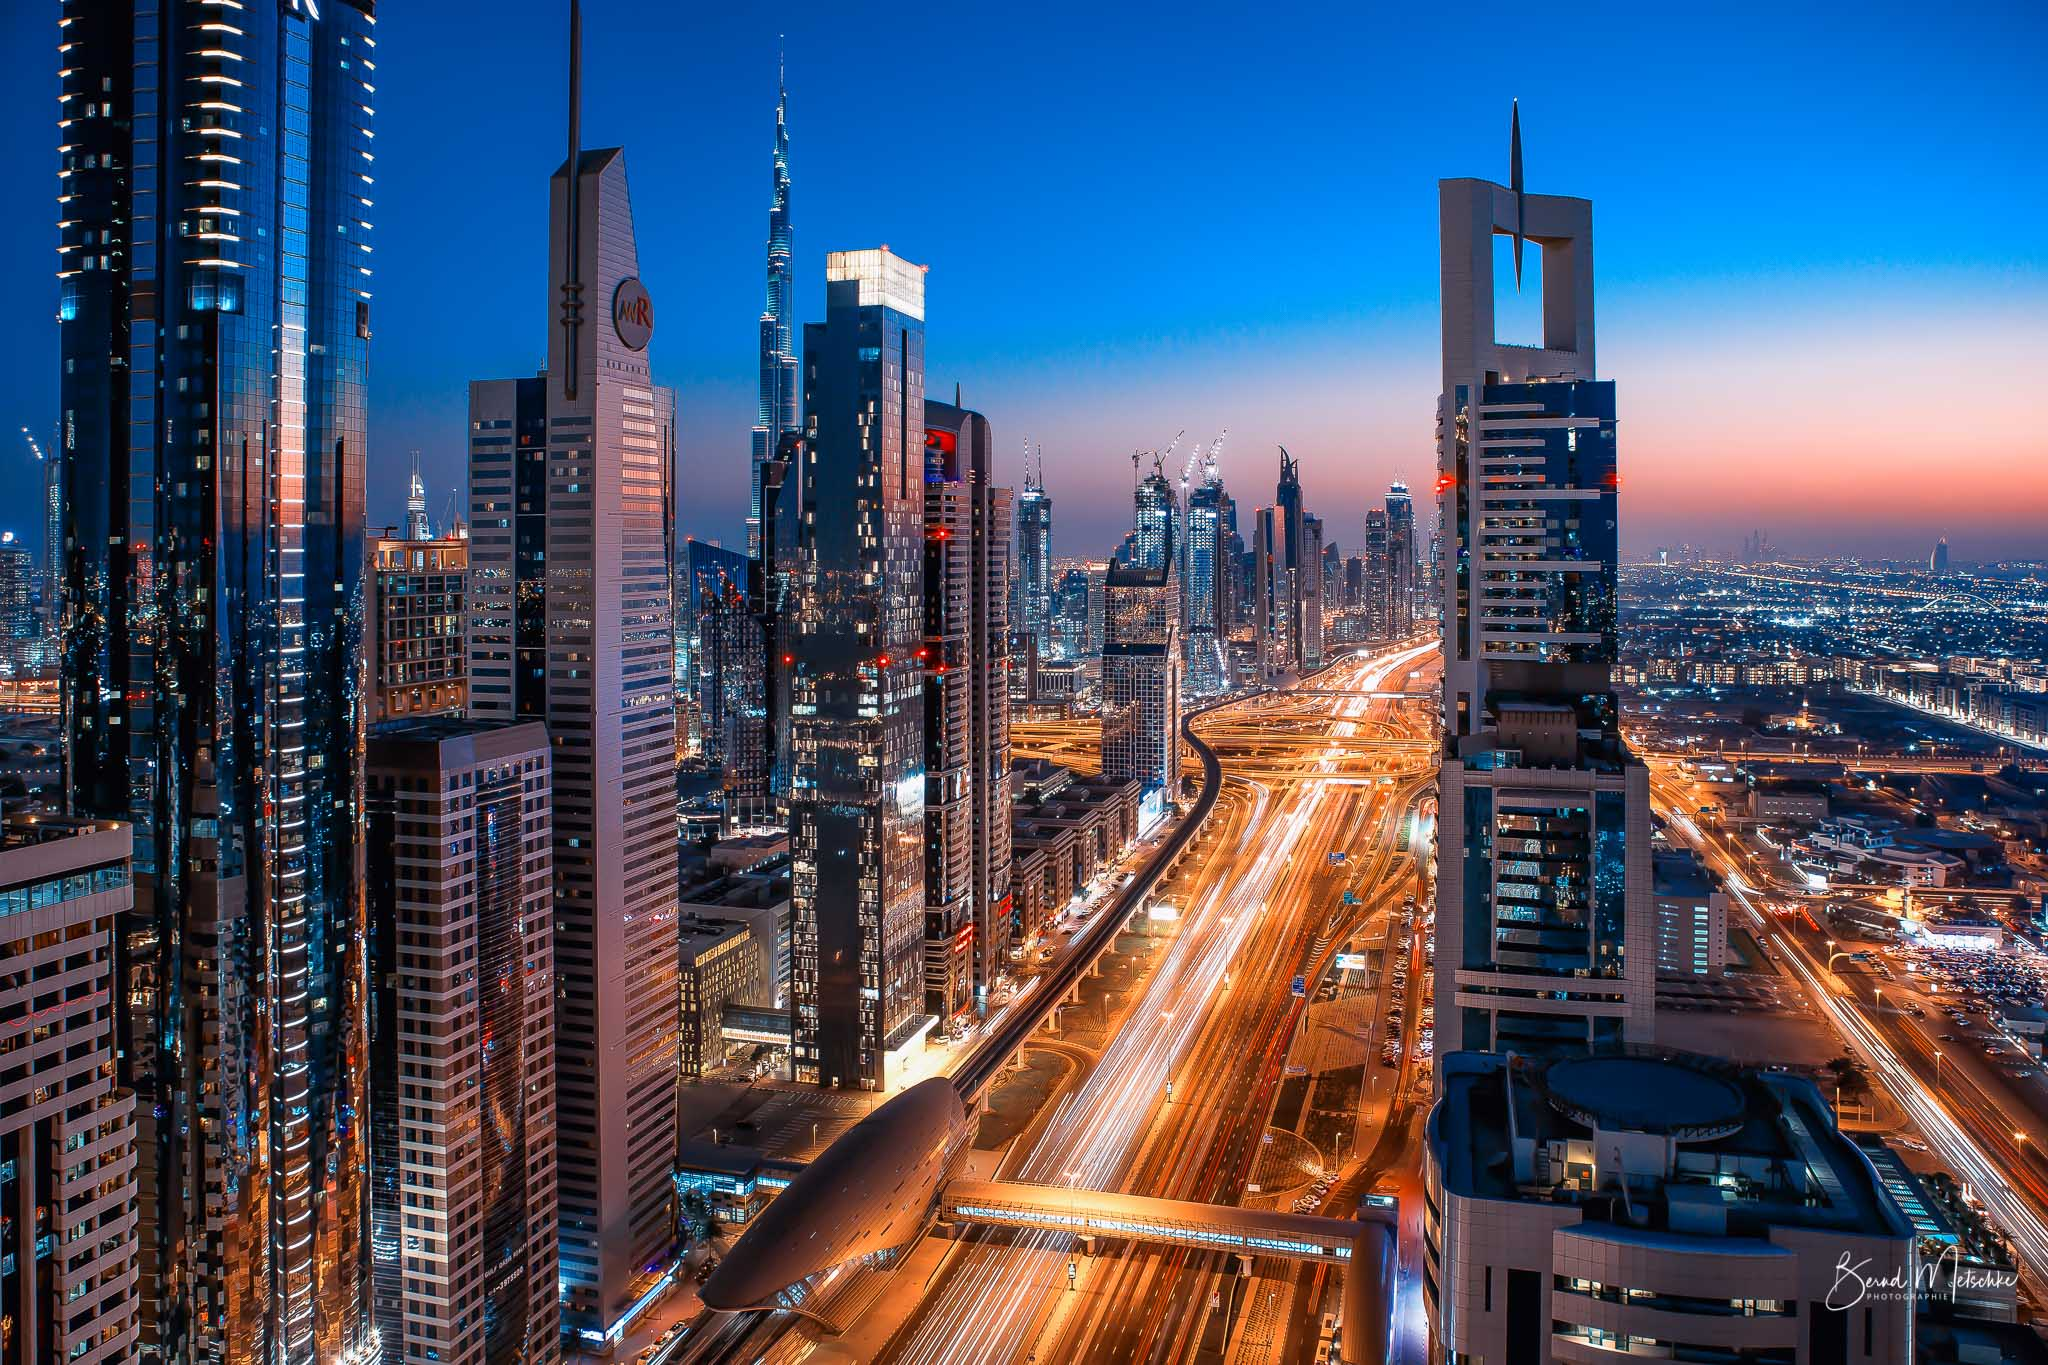 Sheikh Zayed Road am Abend